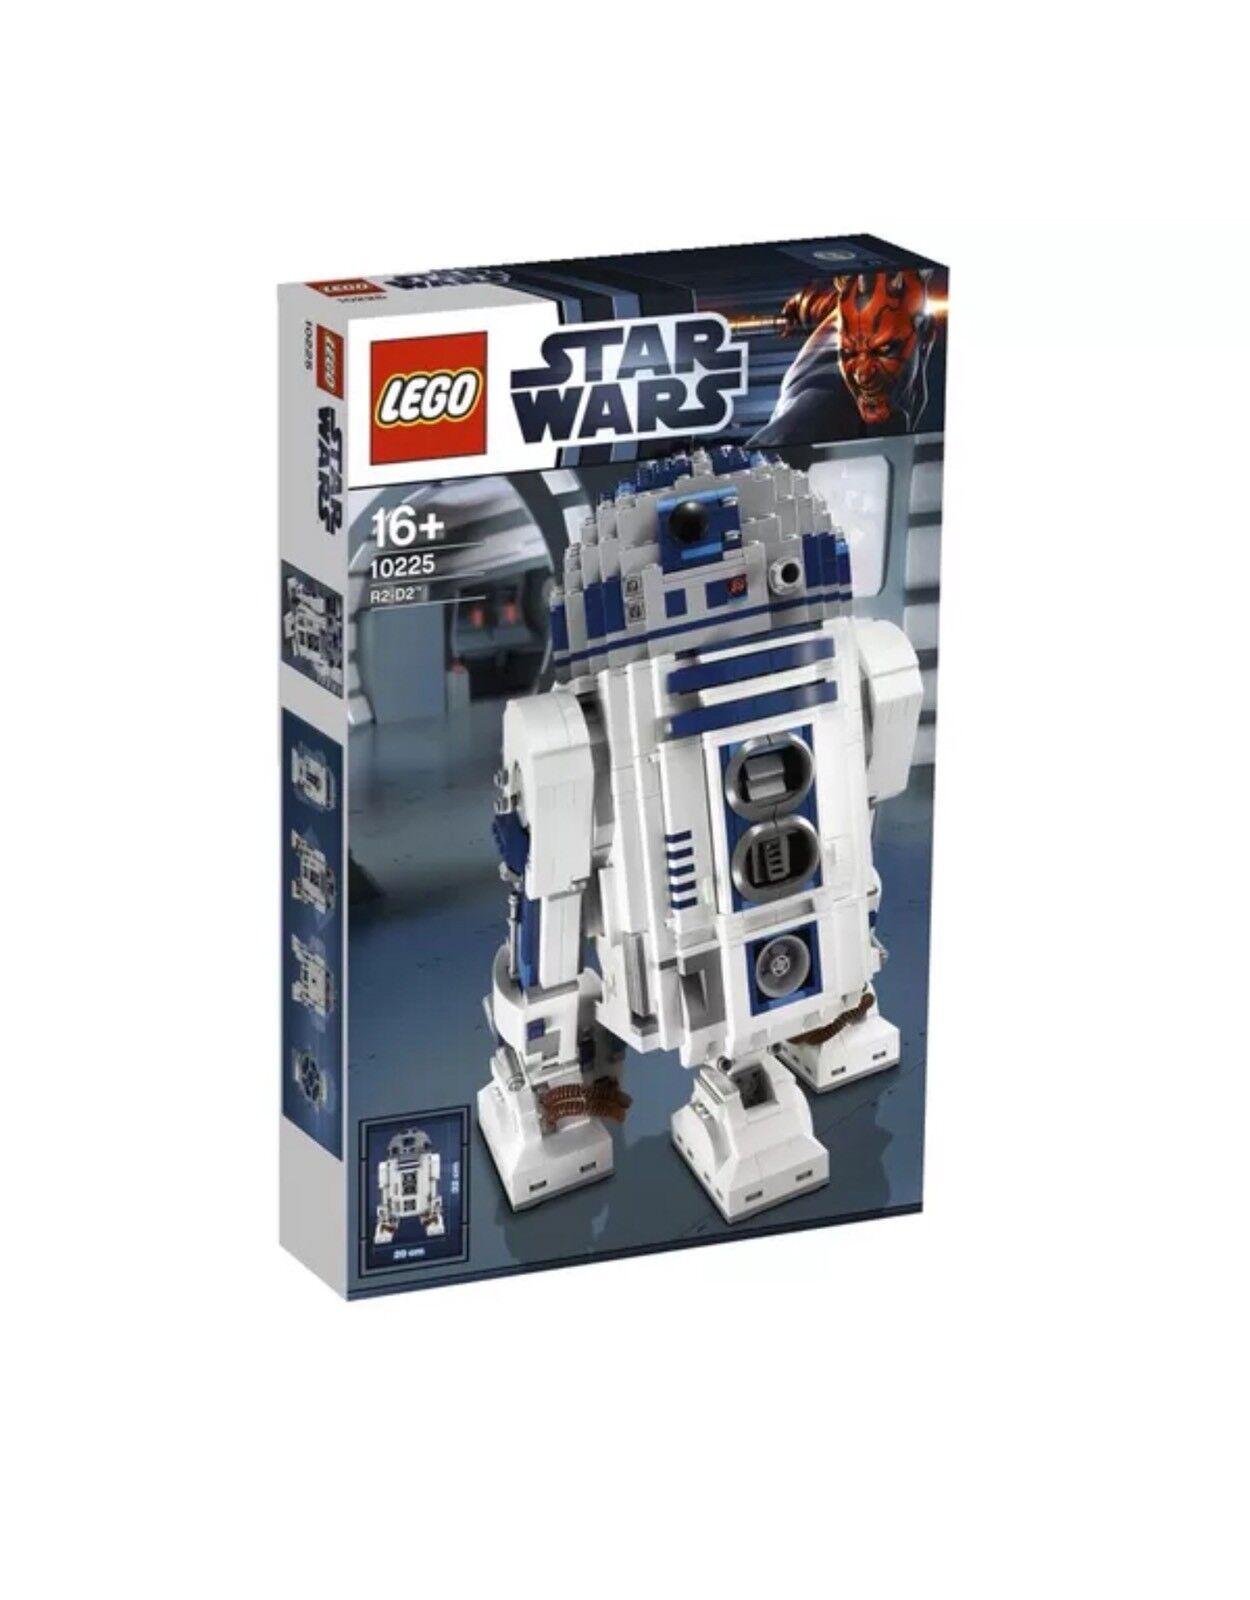 Lego Star Wars 10225 R2-D2 UCS Nuevo Sellado retirado